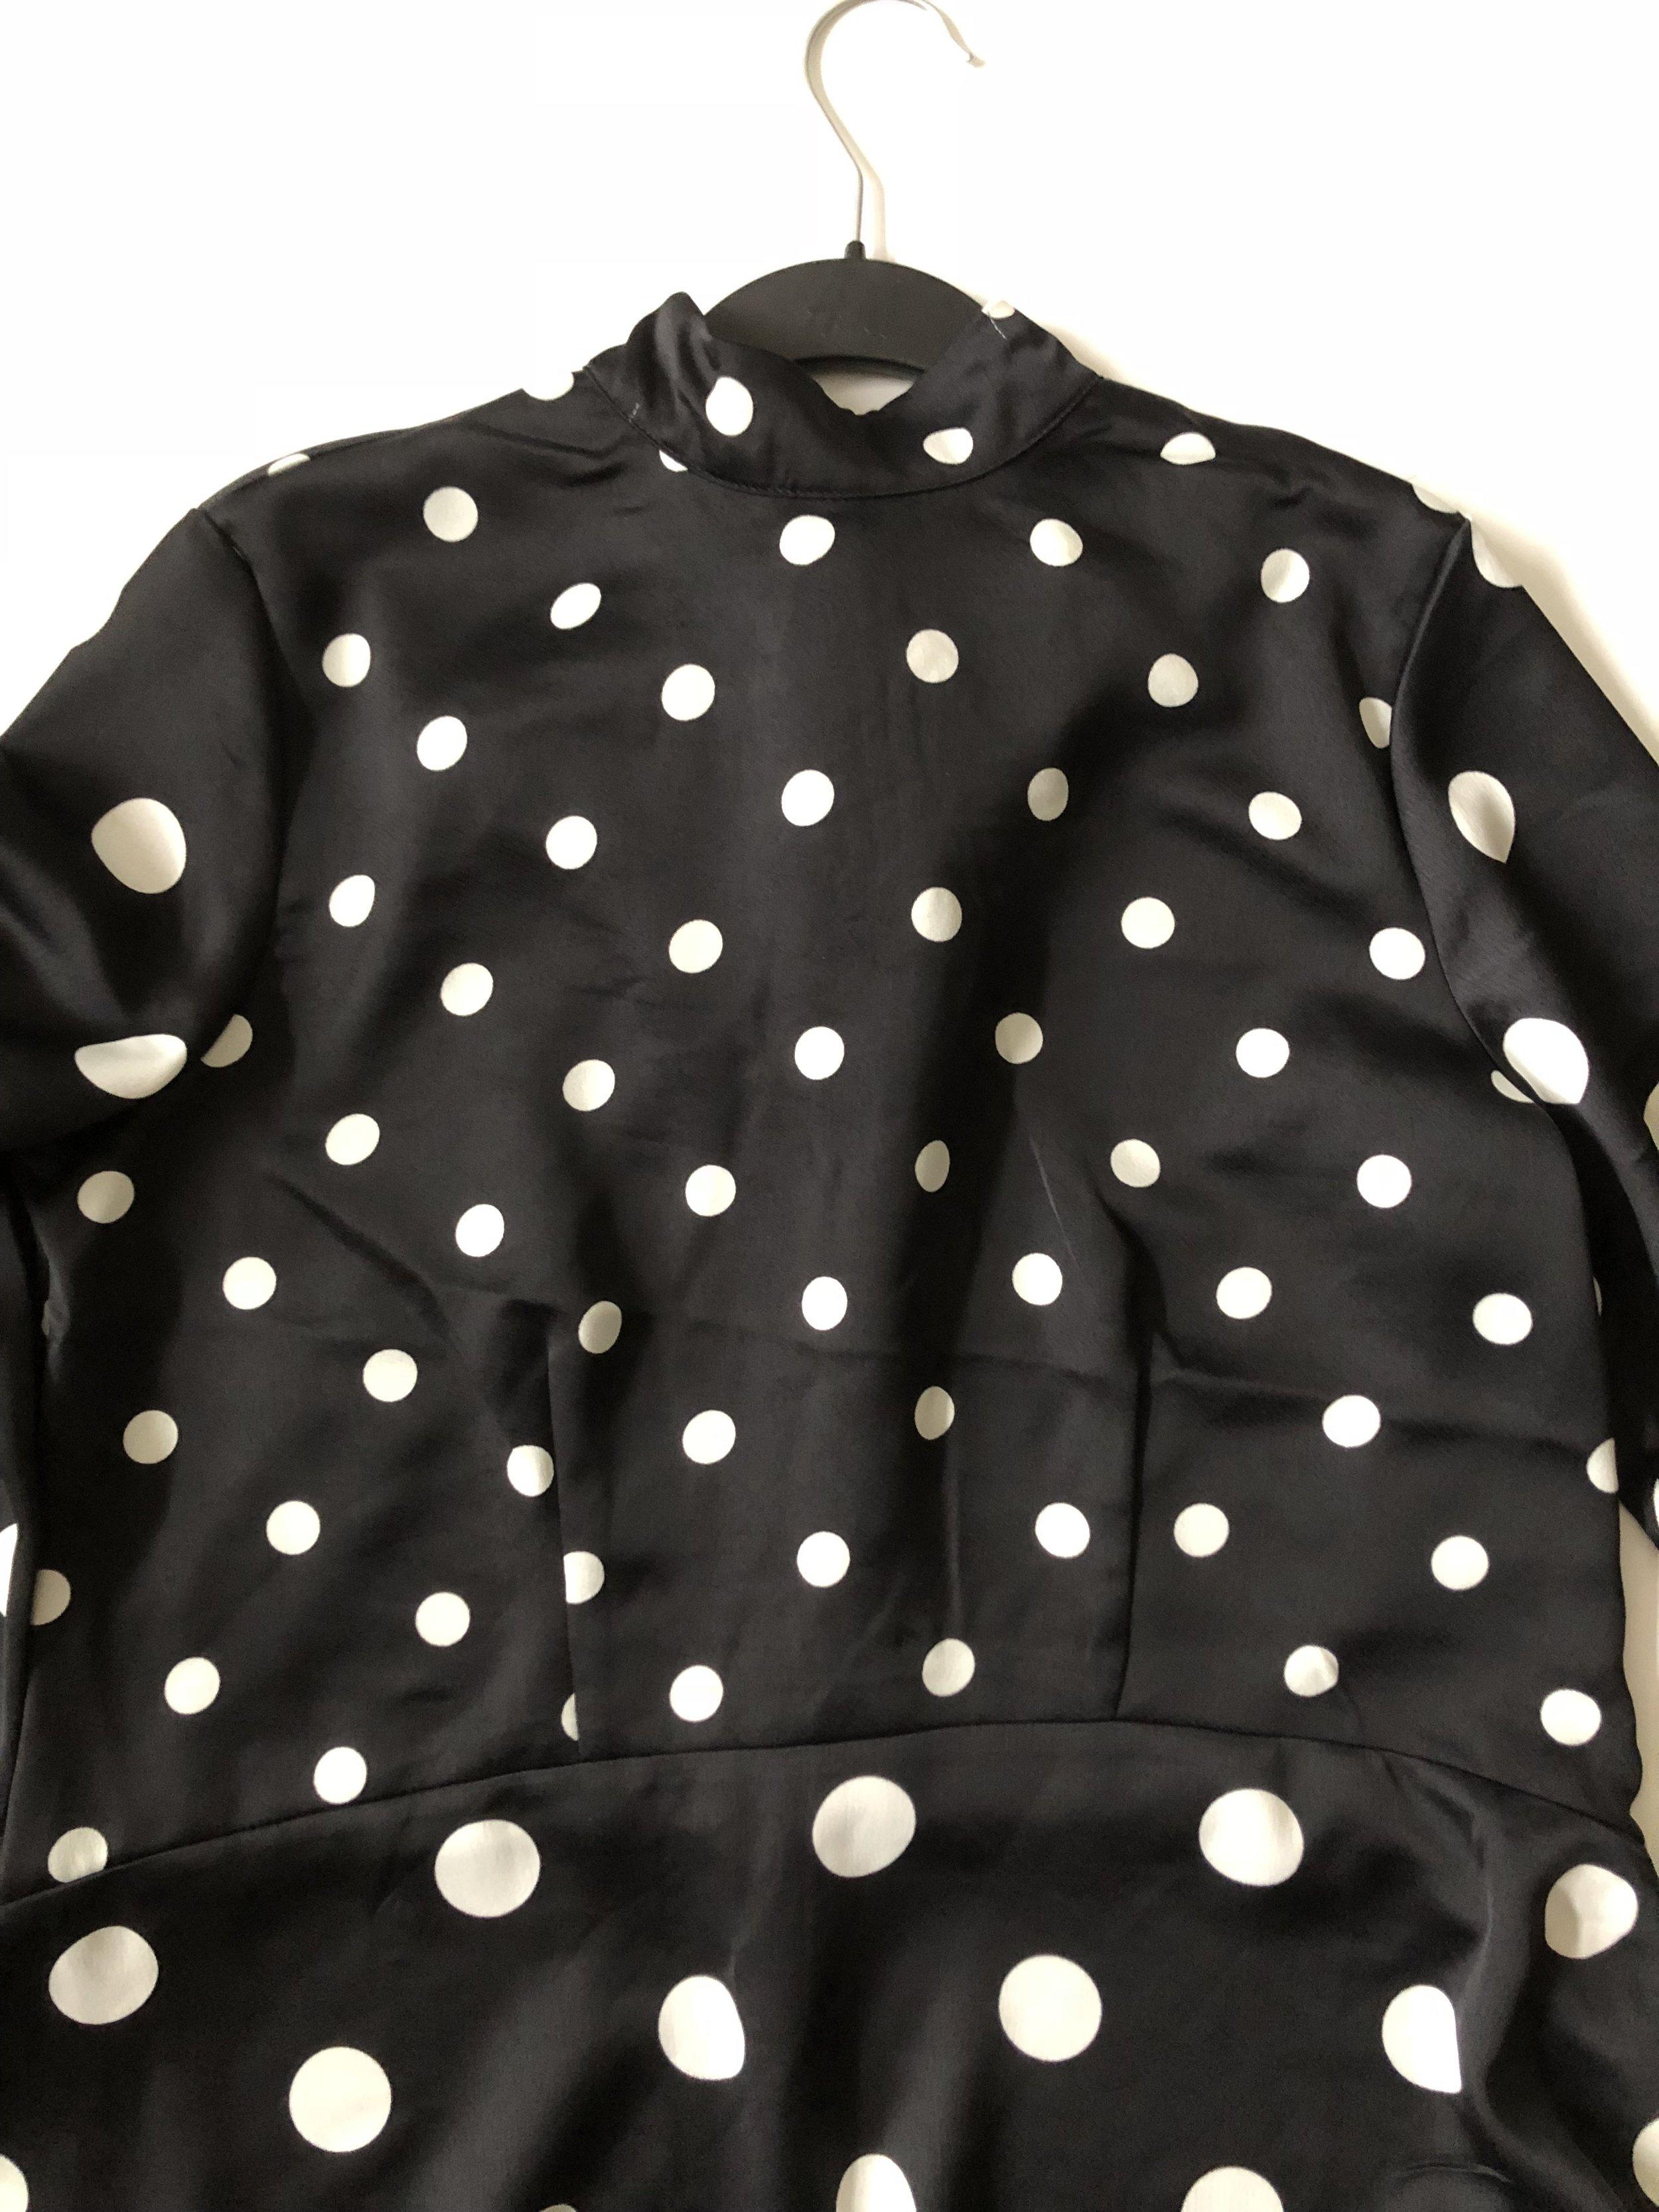 H&M polka dot silk blouse $13.00 (front), size medium.